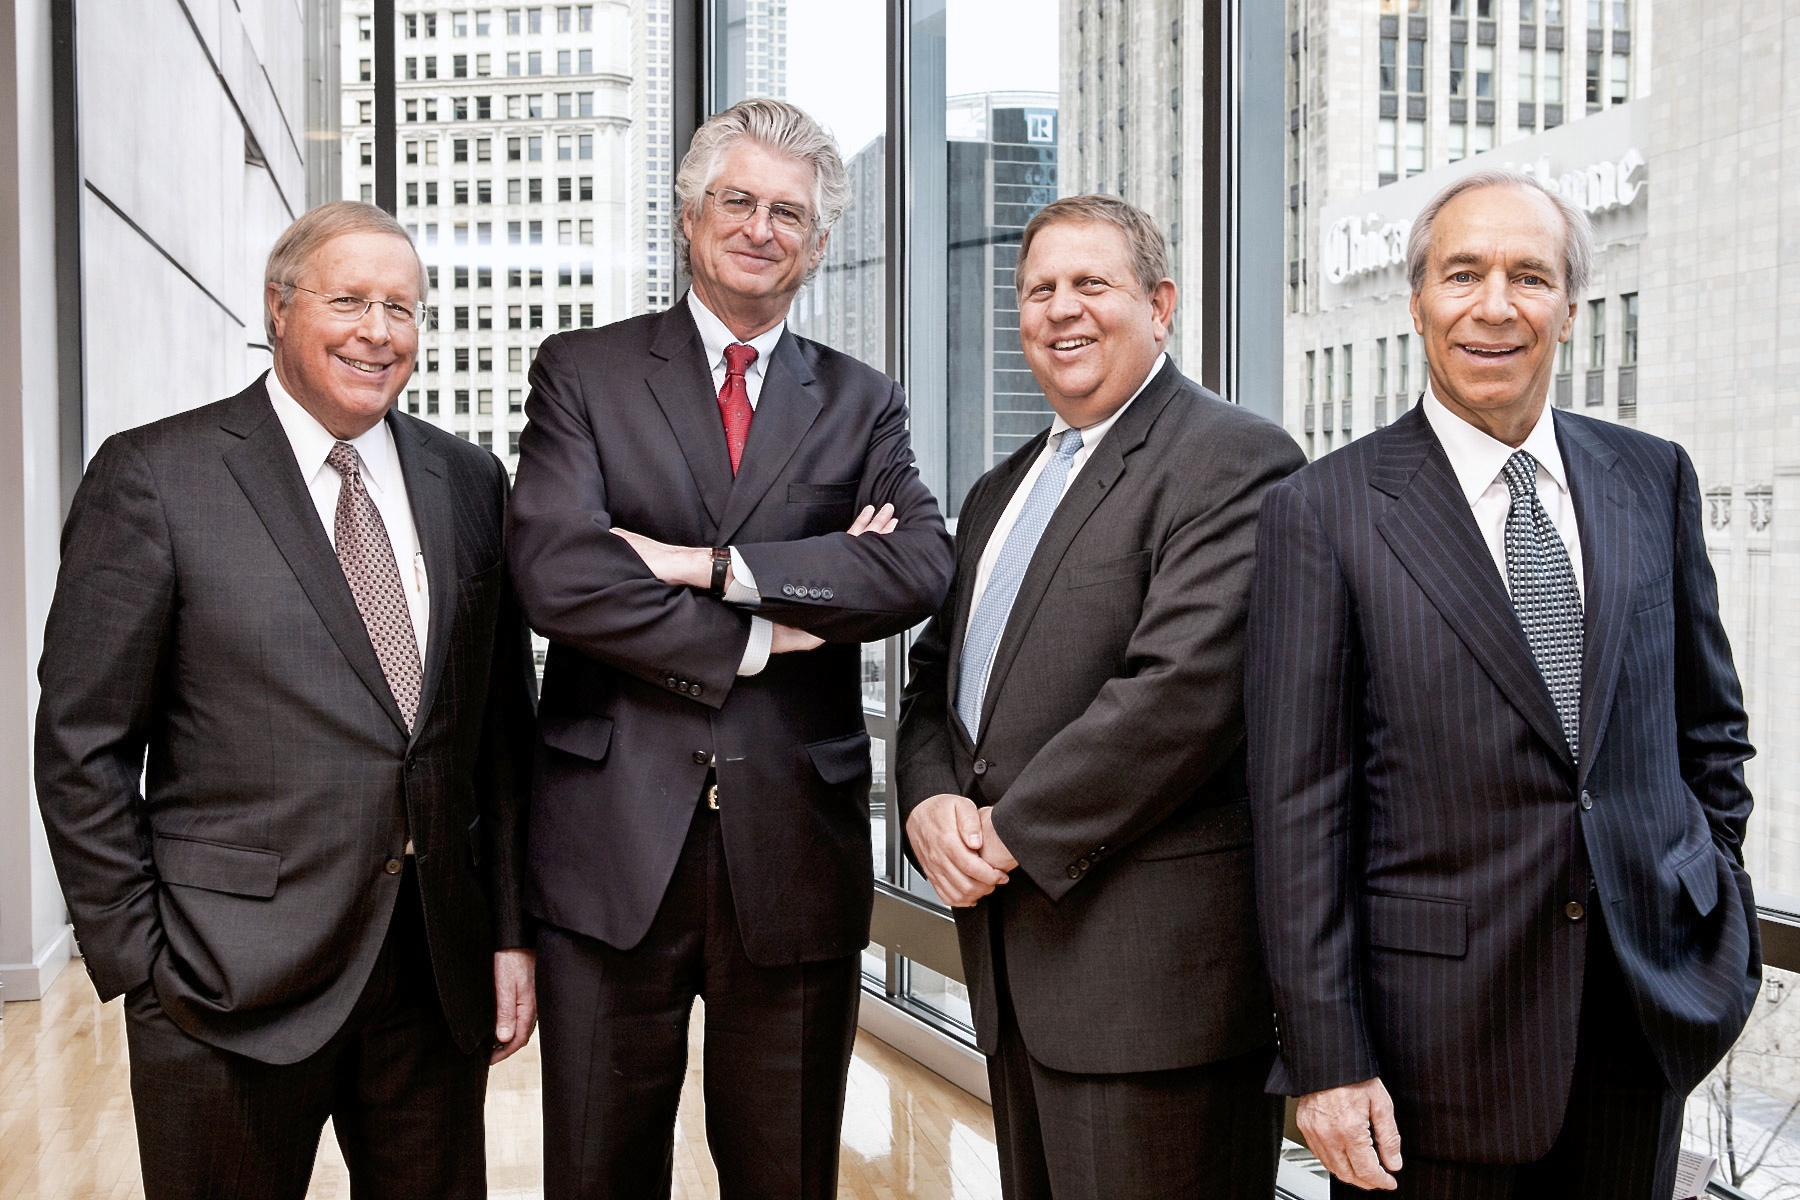 Executive-Portrait-Group-Enviormental.jpg